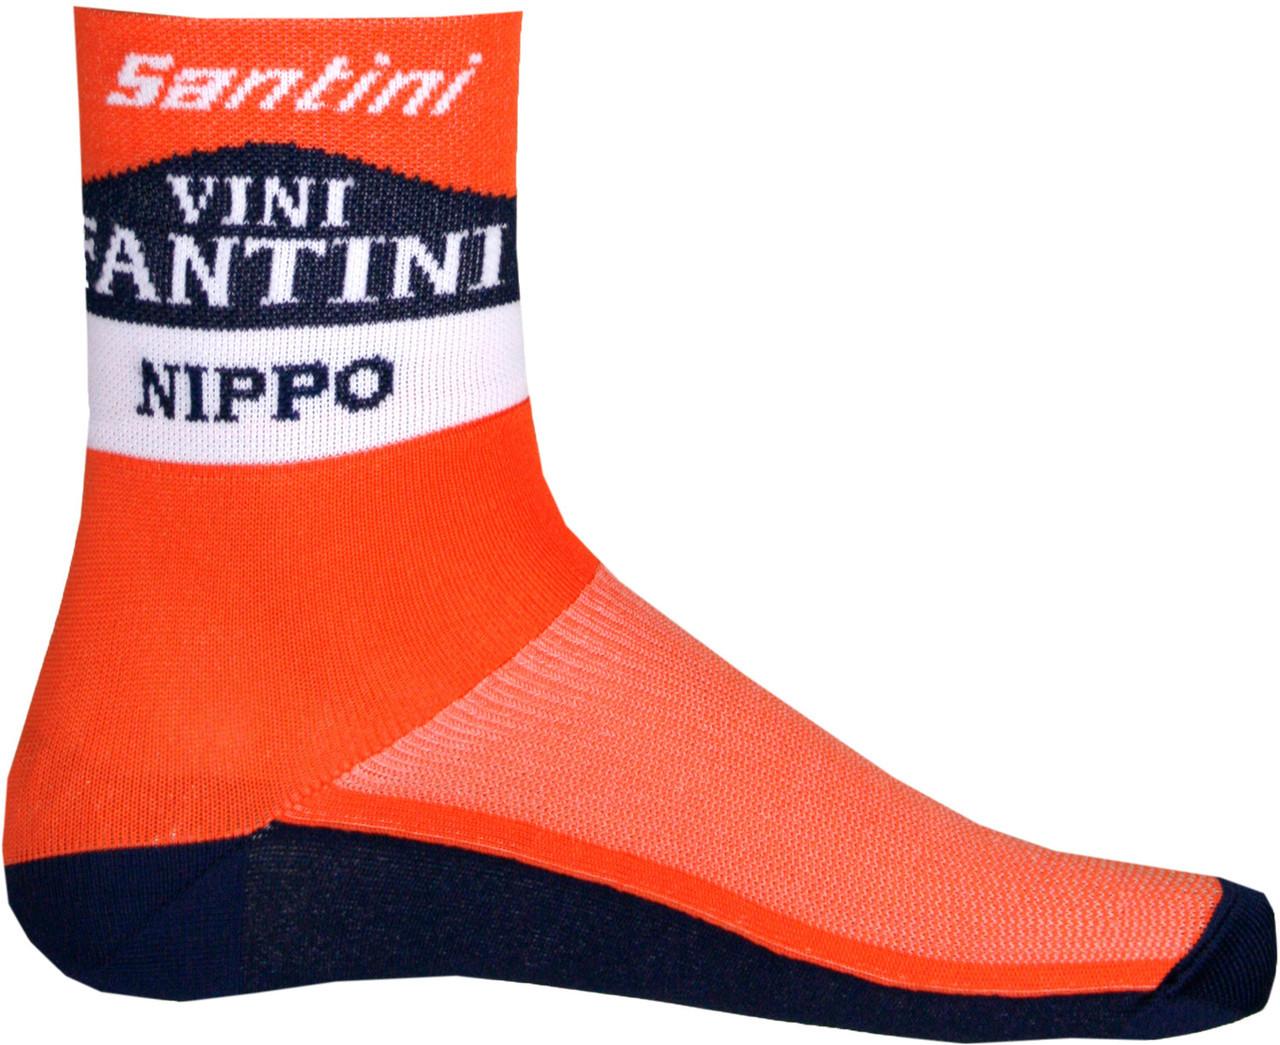 2019 Vini Fantini Socks